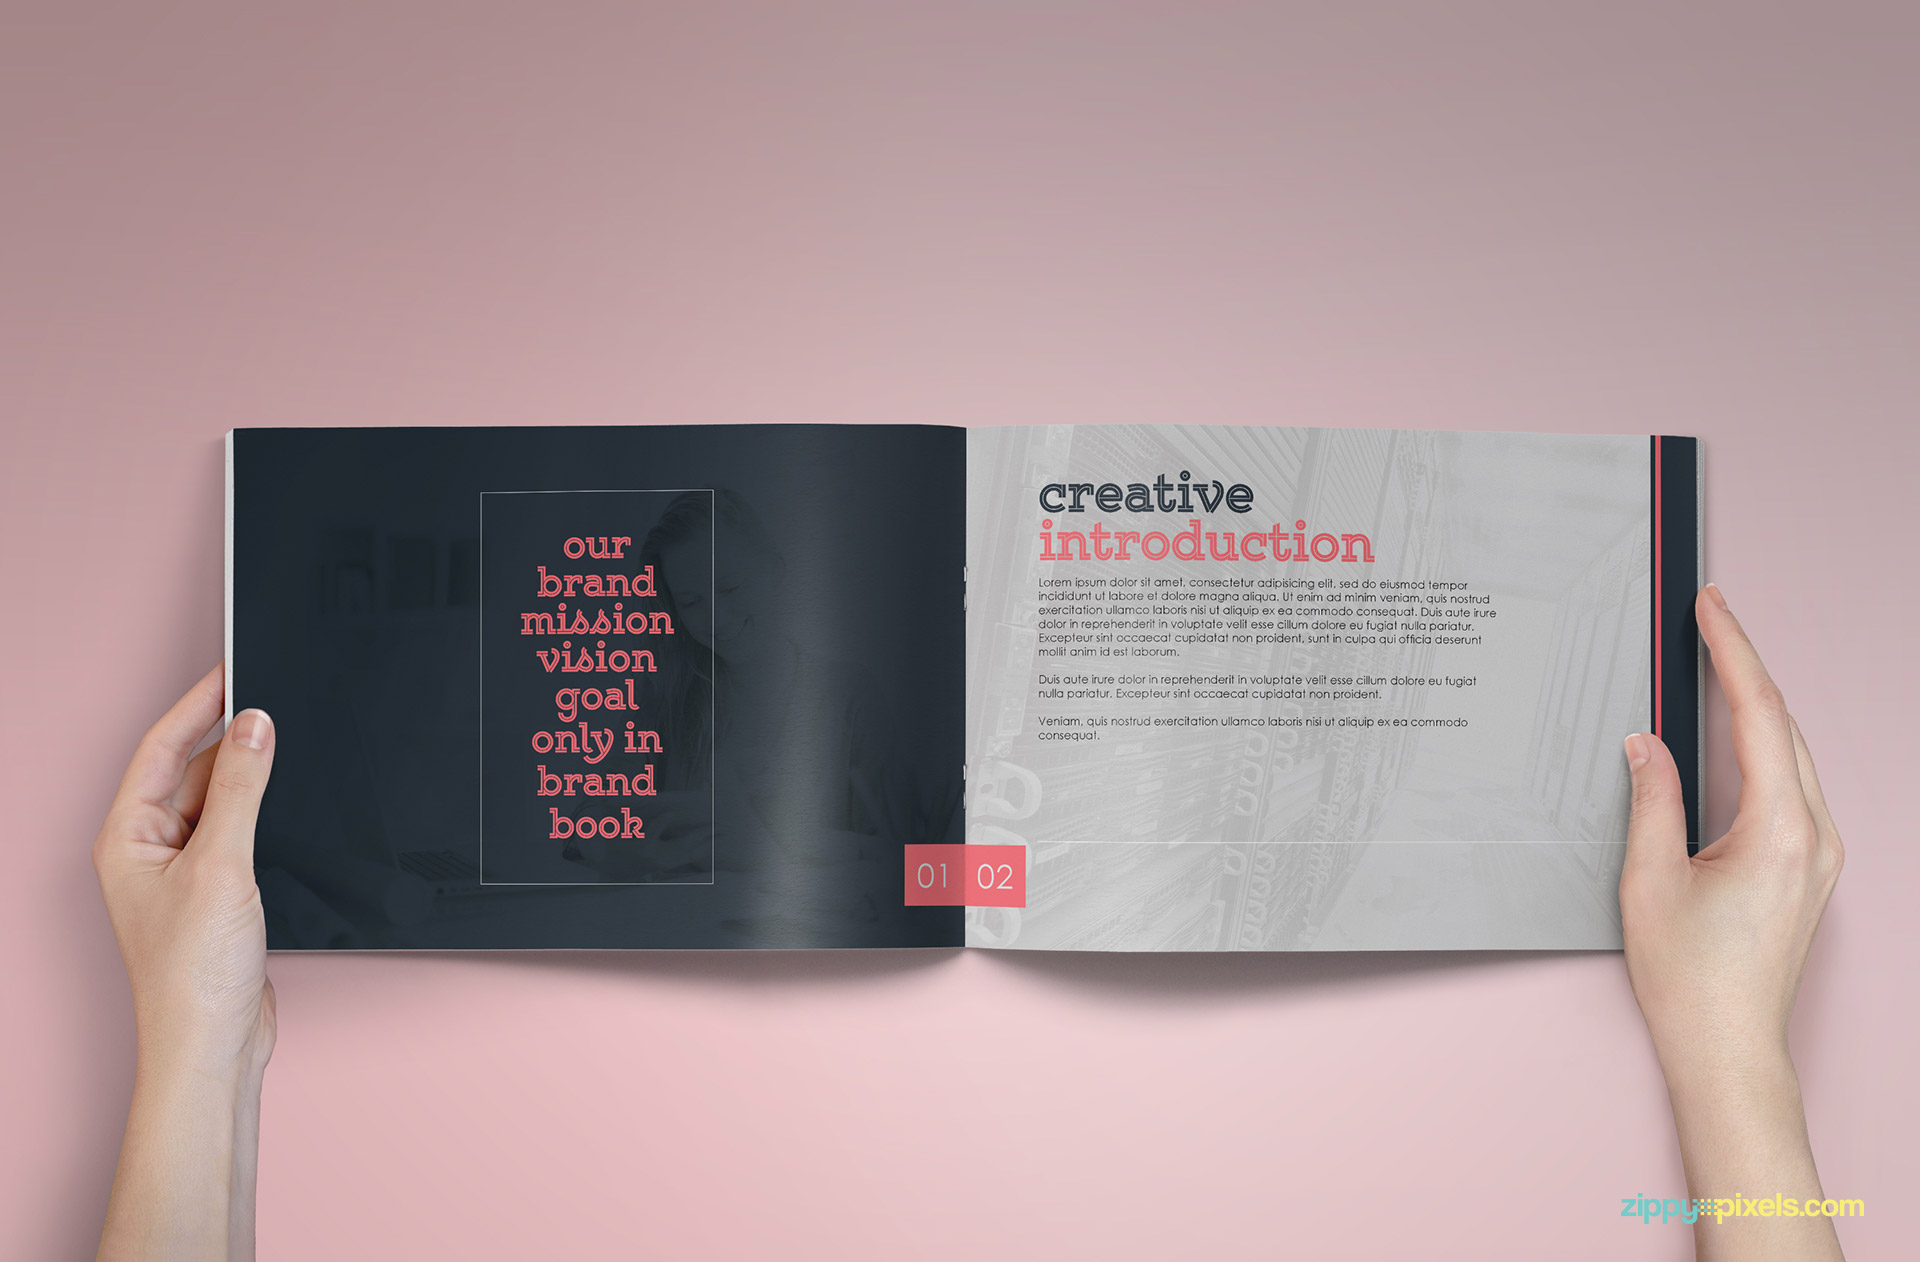 brandbook classic branding guidelines template zippypixels. Black Bedroom Furniture Sets. Home Design Ideas